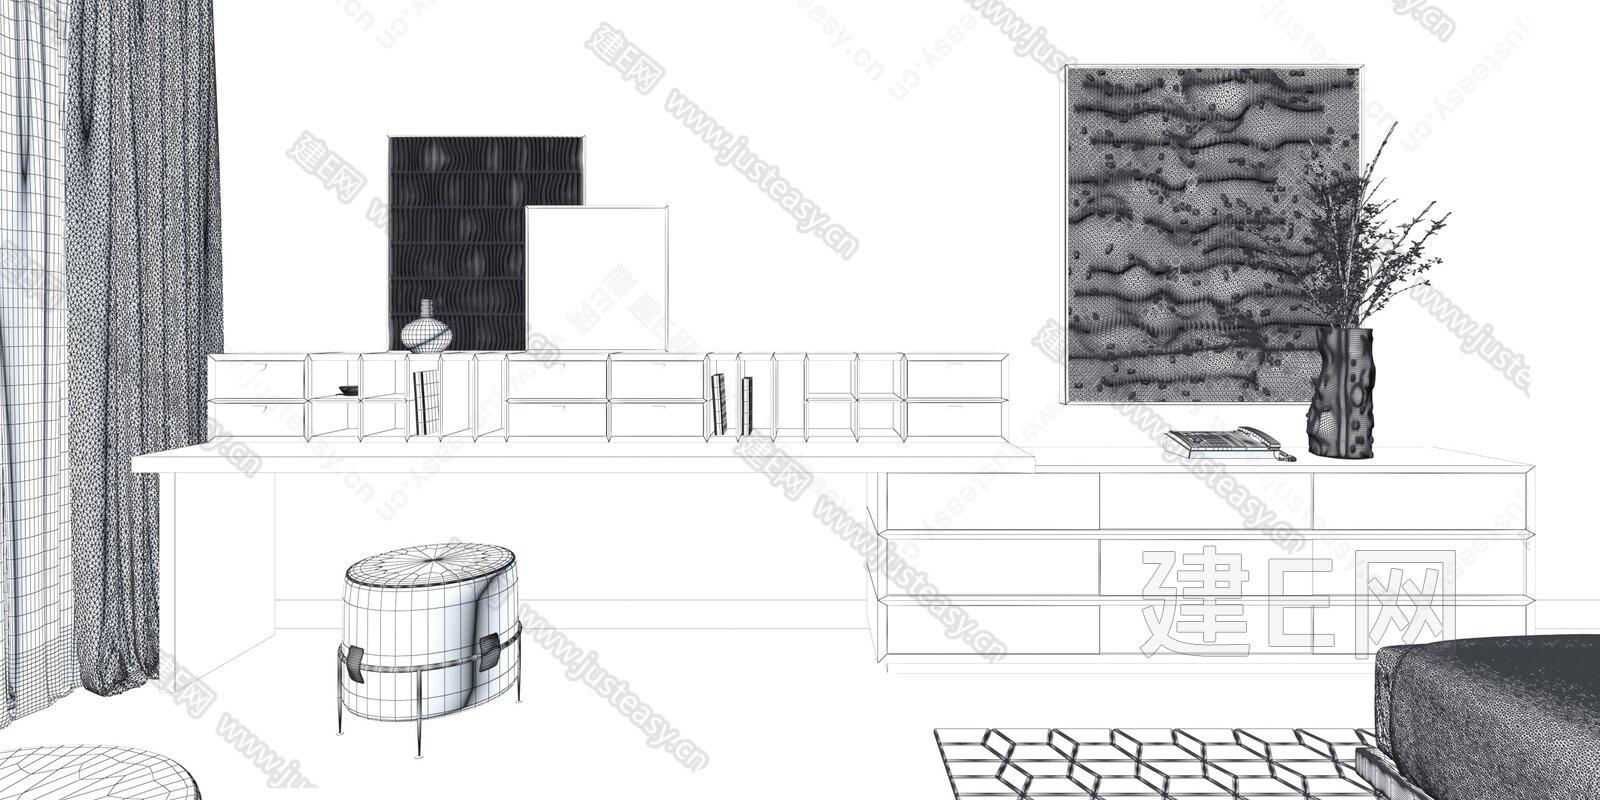 DESIGN羽果设计 现代电视柜梳妆台组合3d模型